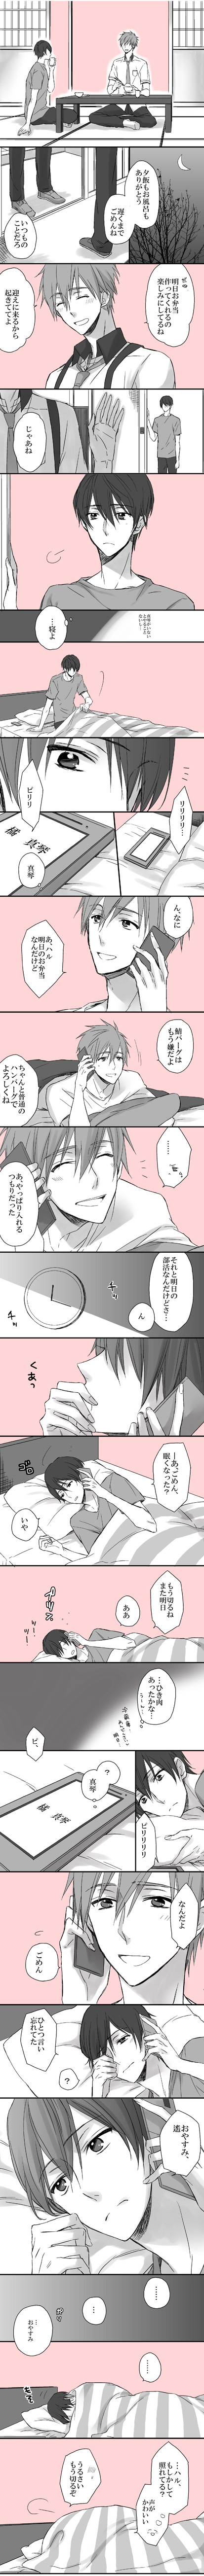 Tags: Anime, Free!, Nanase Haruka (Free!), Tachibana Makoto, Comic, Translated